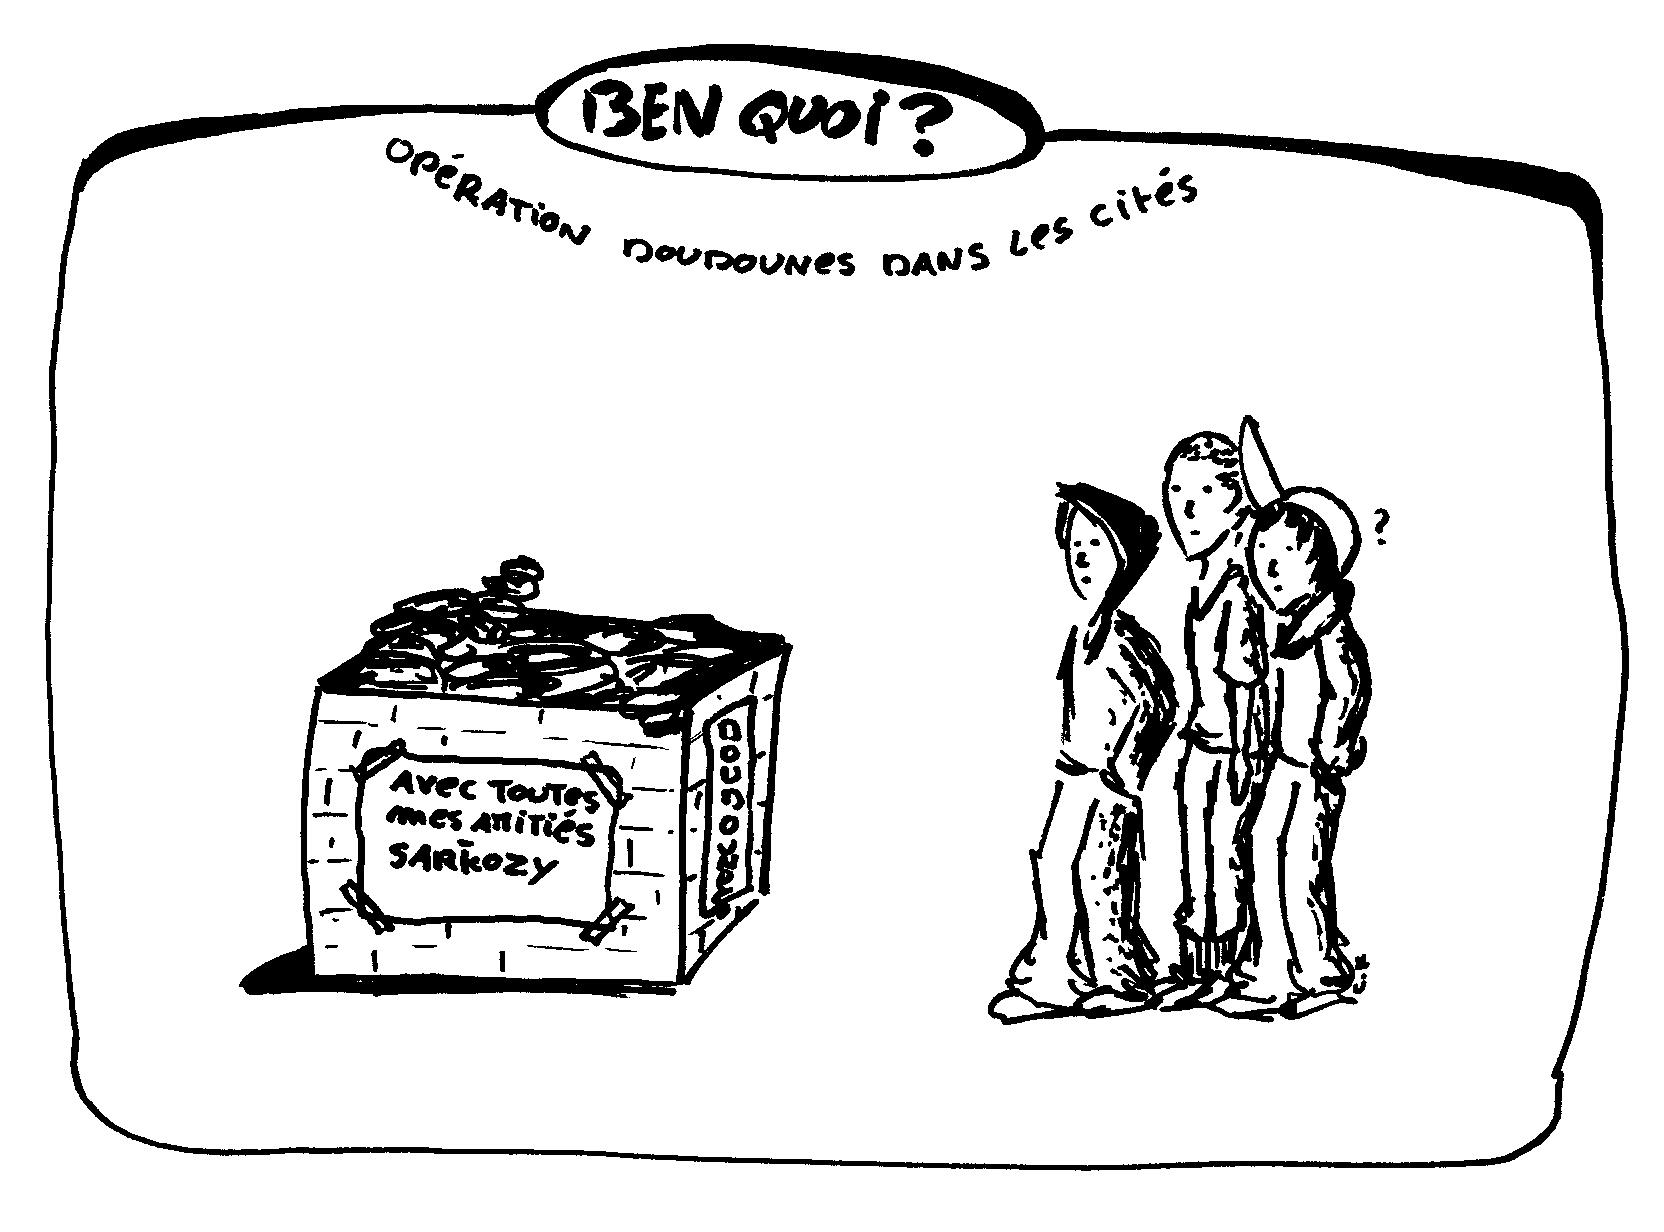 cqfd-benquoi1-2.jpg